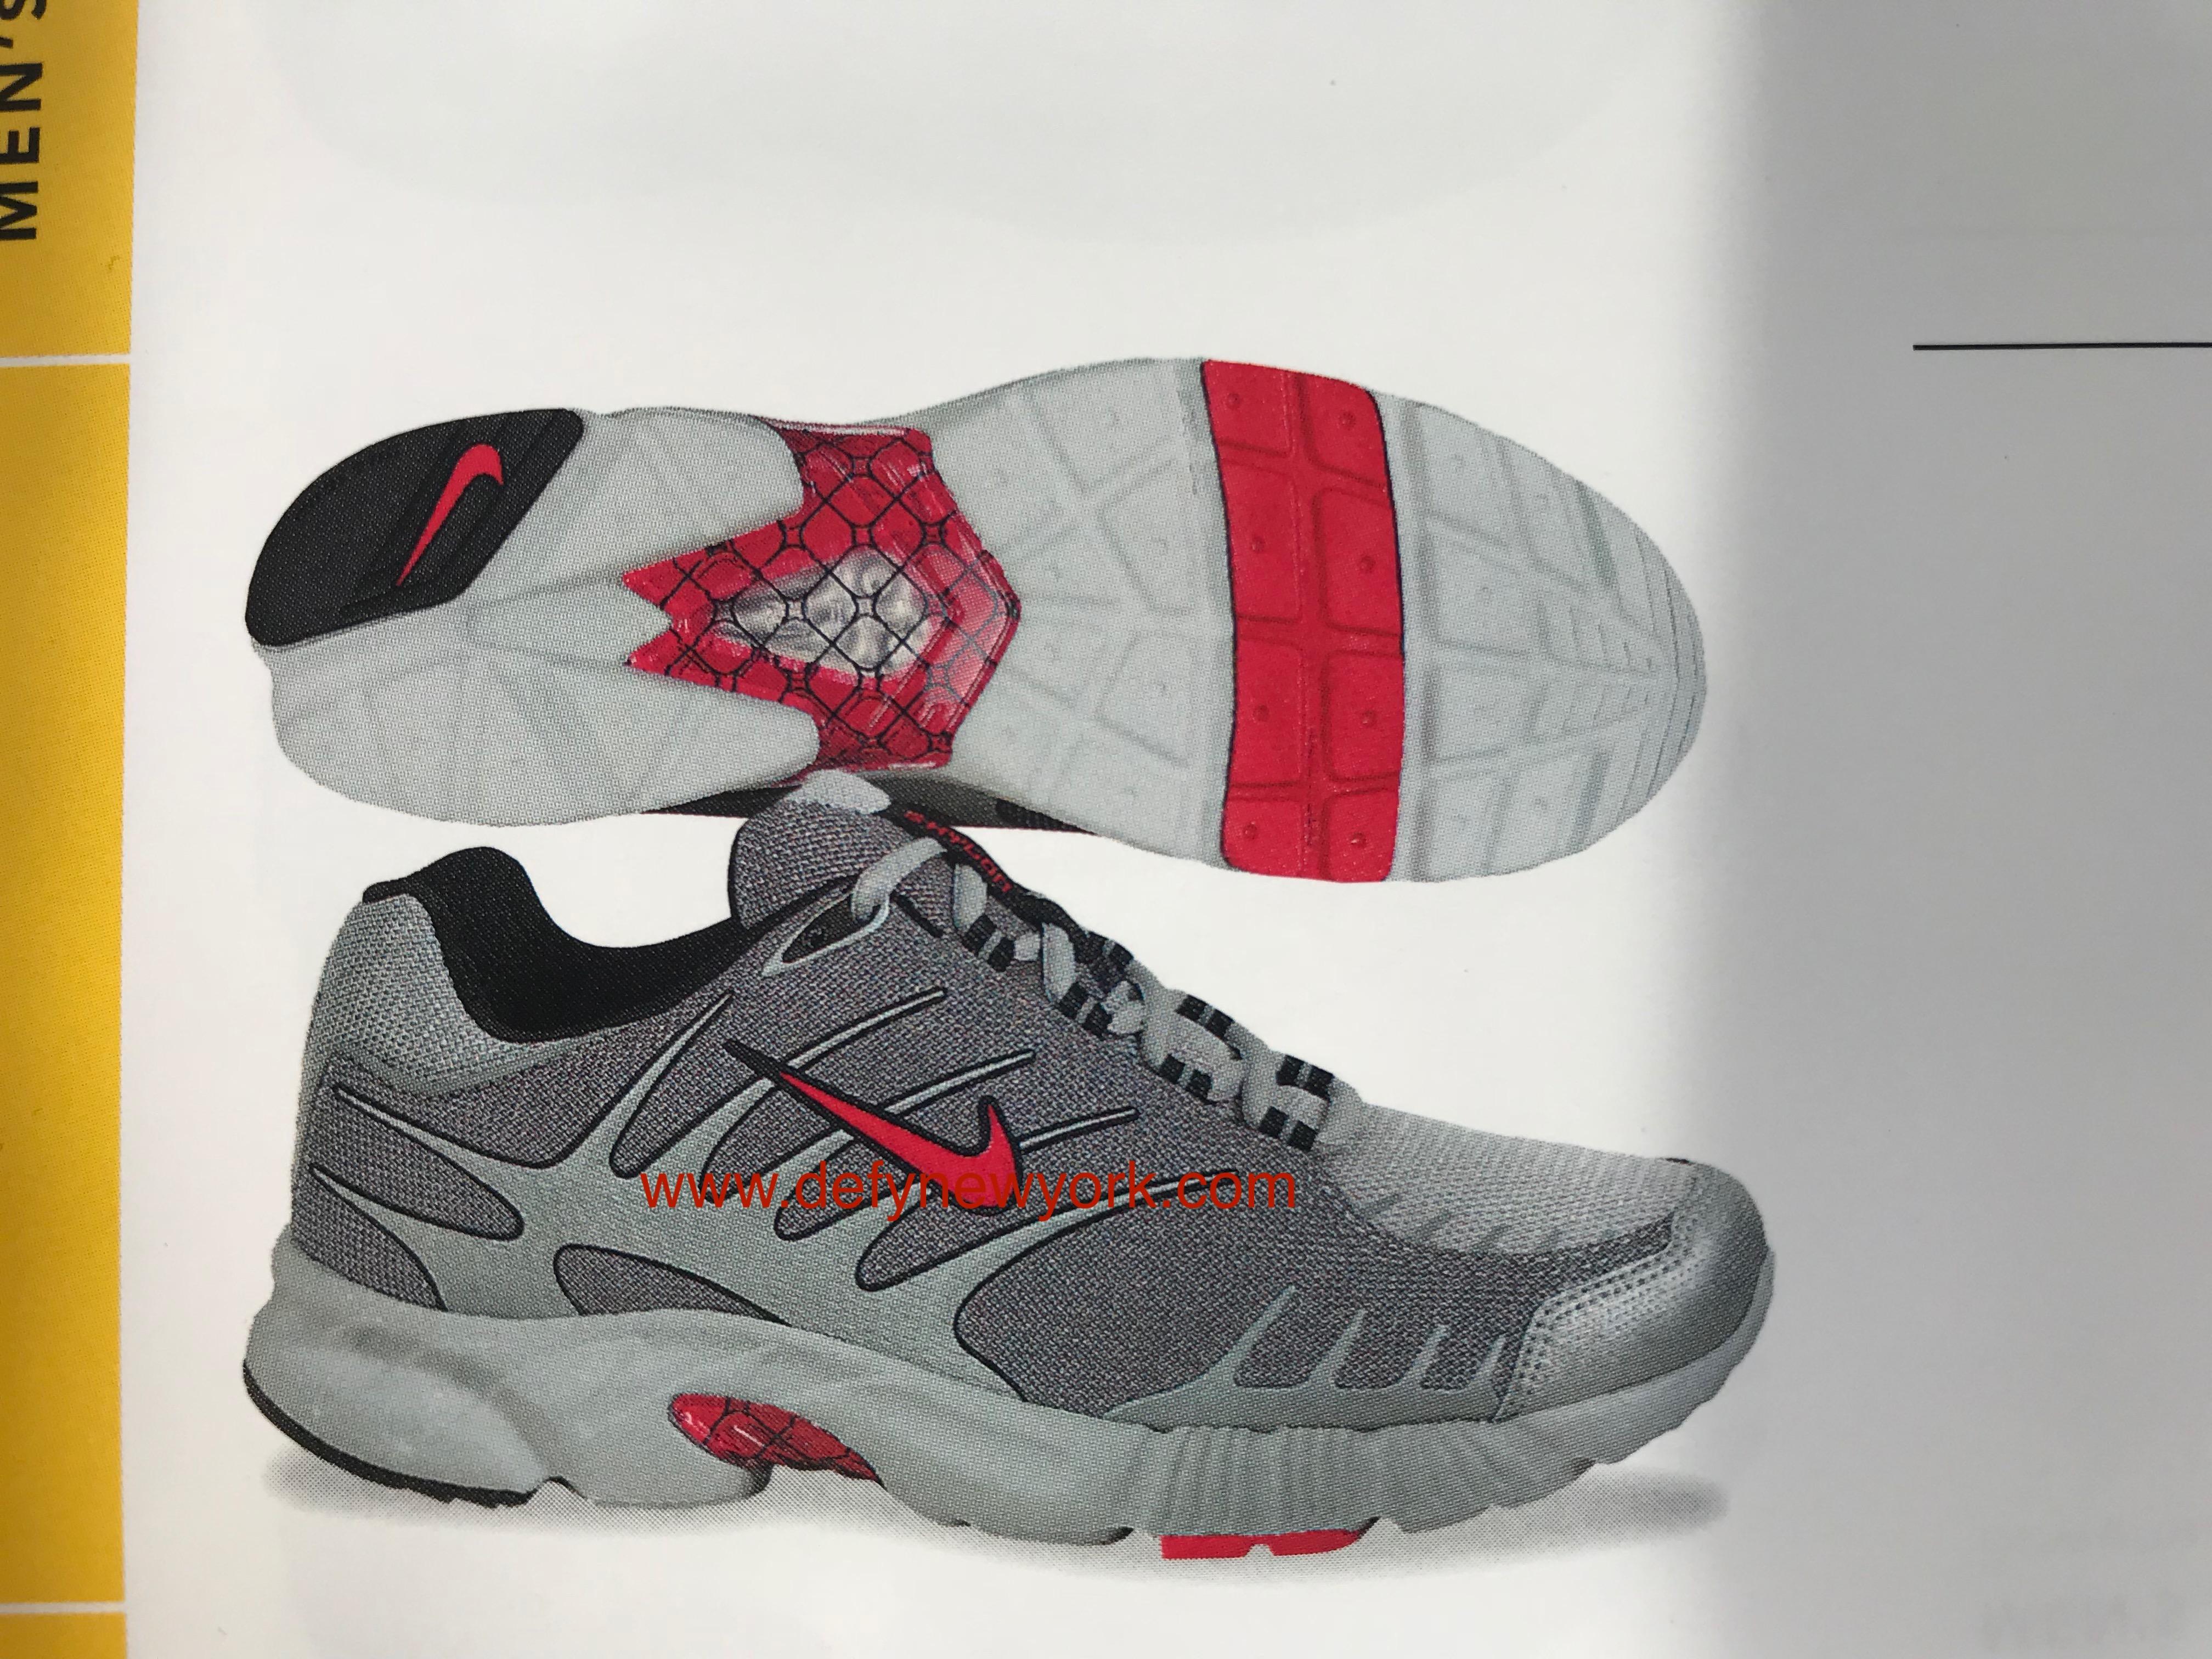 the best attitude f4e30 a2c6c Nike Air Skylon Running Shoe 2003  DeFY. New York-Sneakers,M